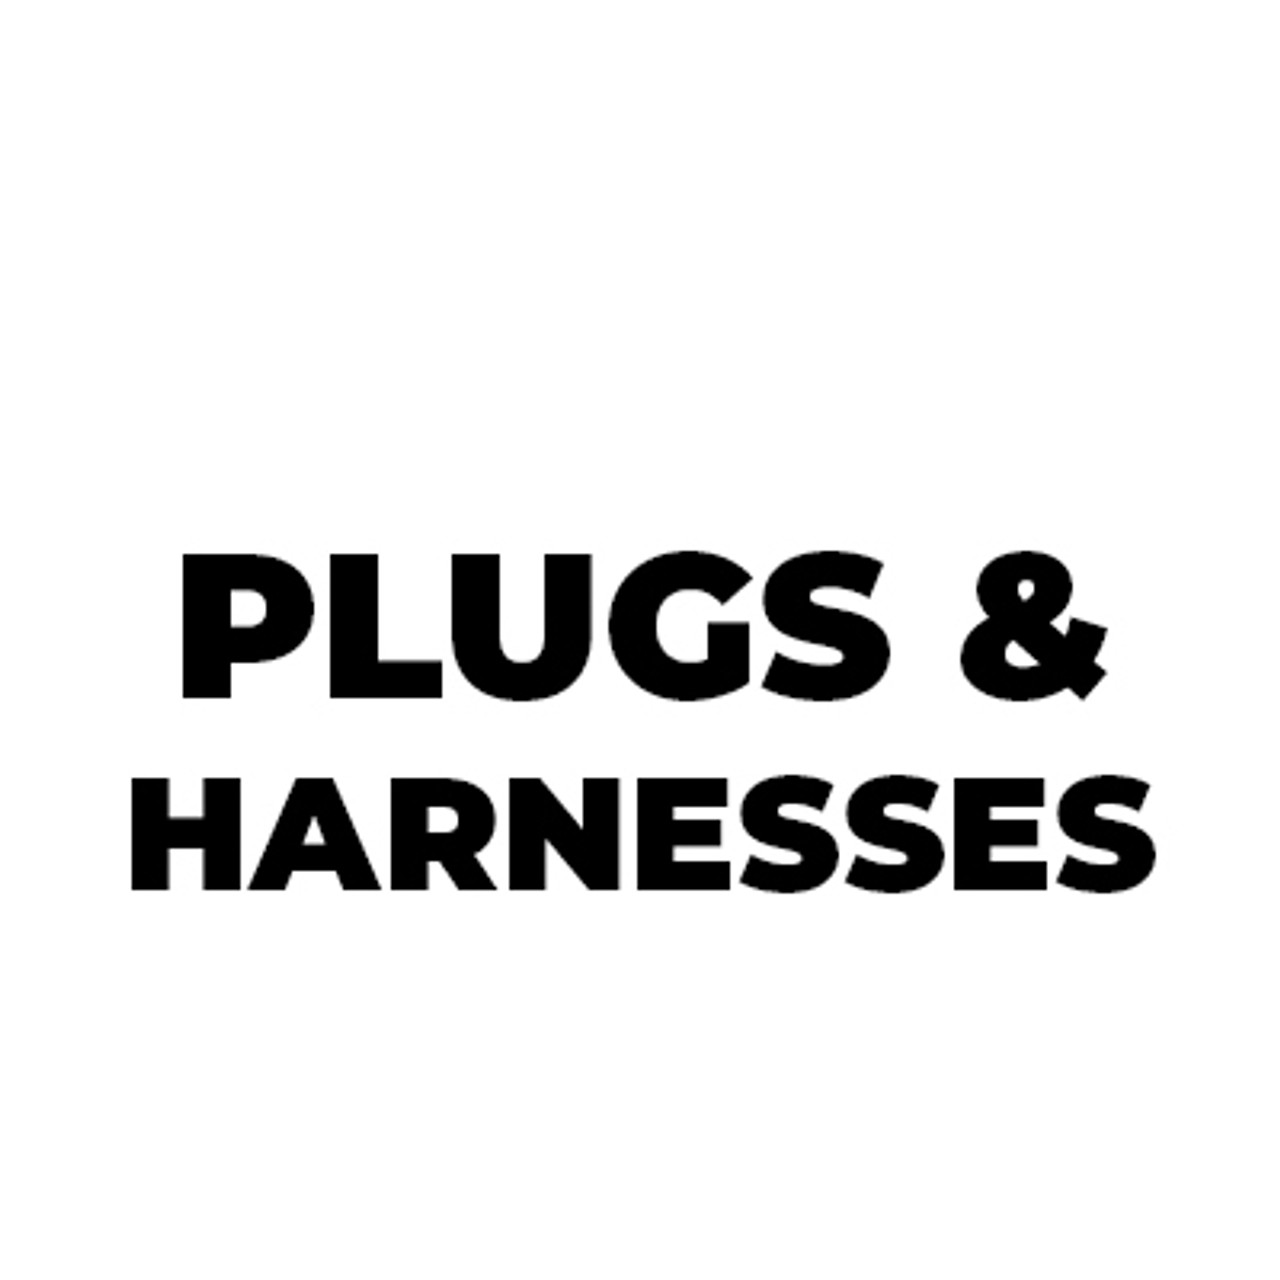 Plugs & Harnesses